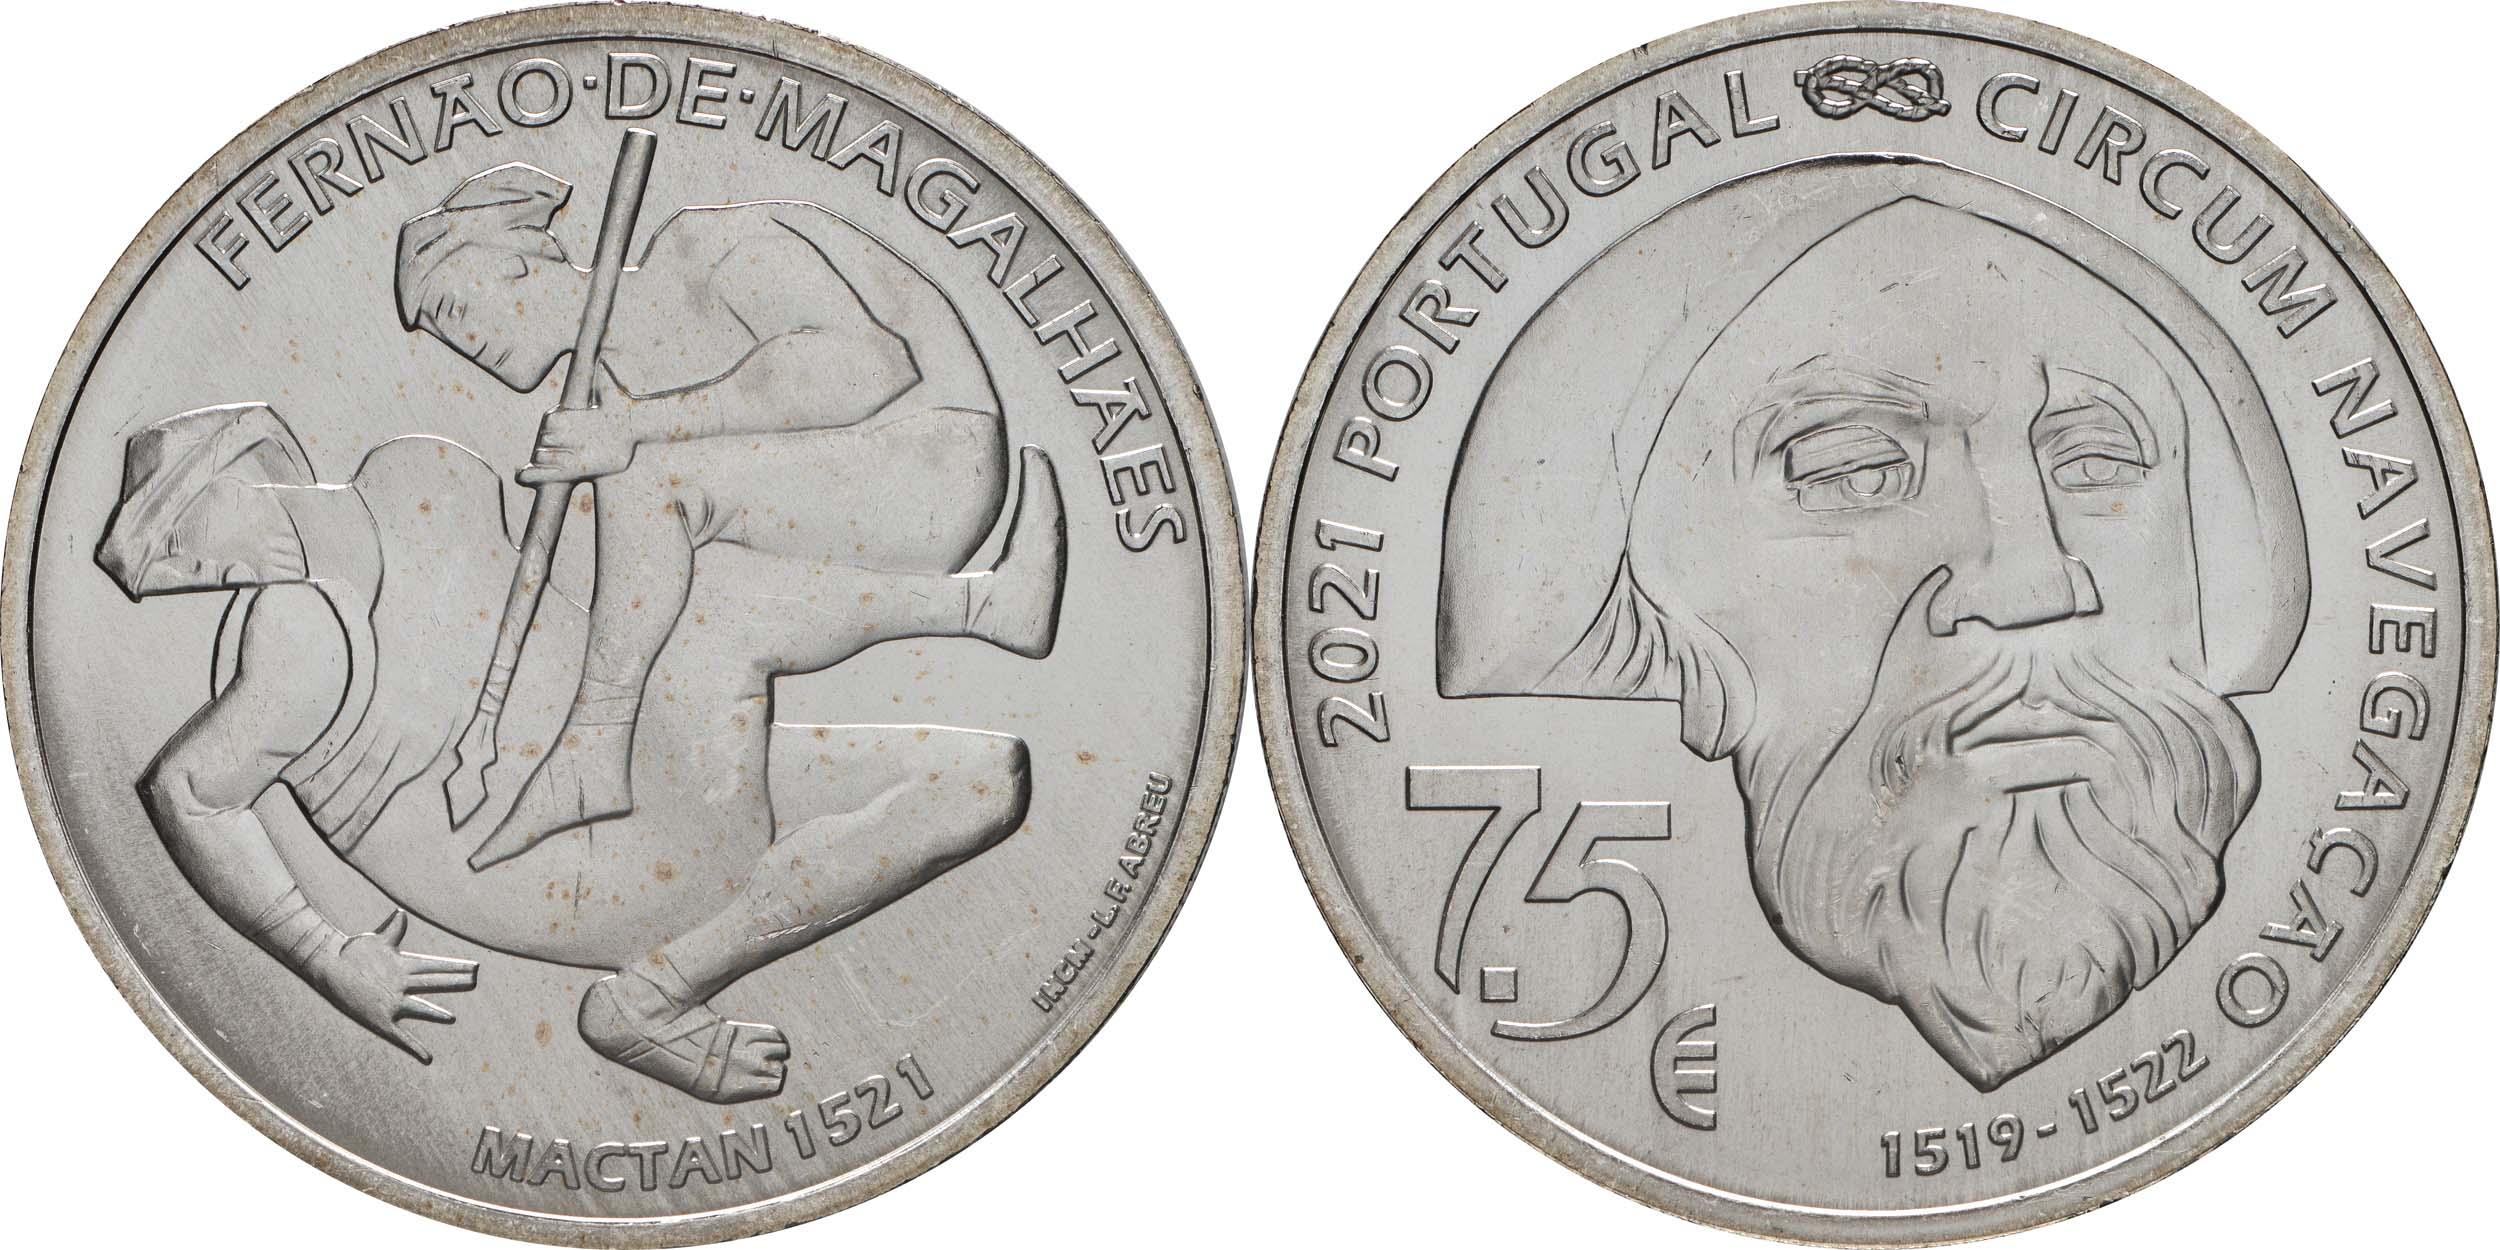 Lieferumfang:Portugal : 7,5 Euro 1521 Mactan  2021 bfr